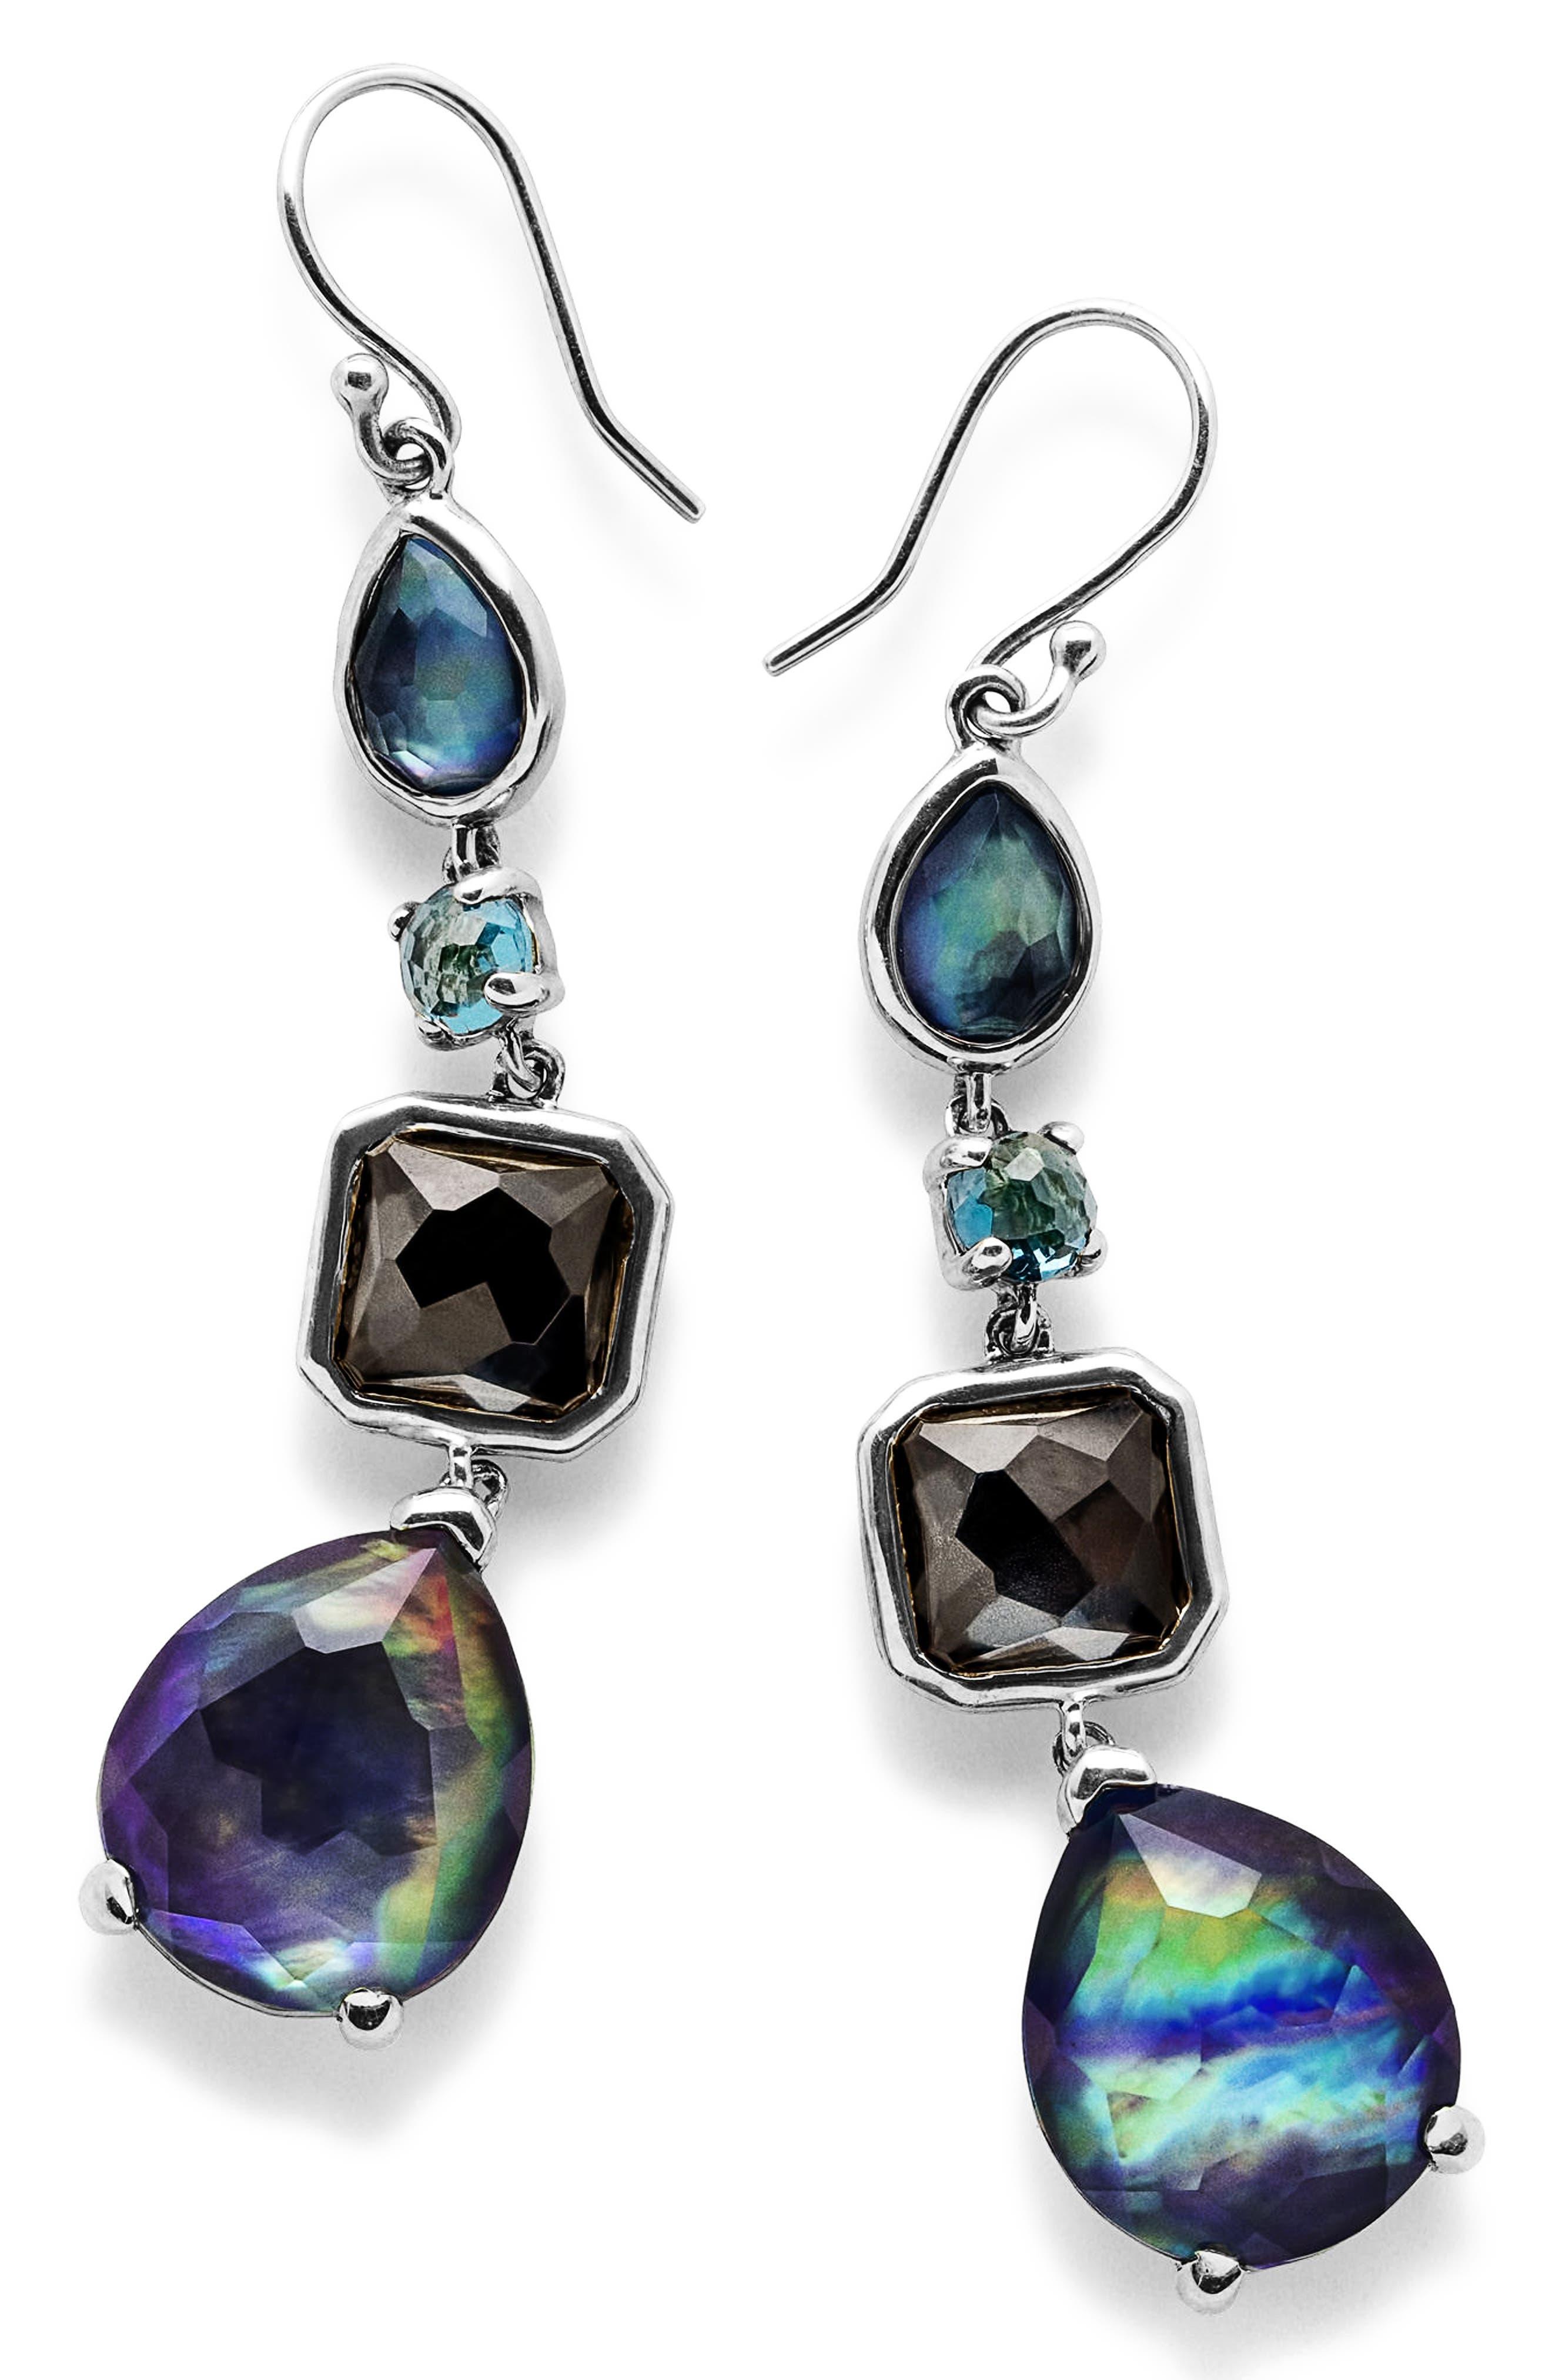 'Rock Candy' Linear Drop Earrings,                             Main thumbnail 1, color,                             Eclipse